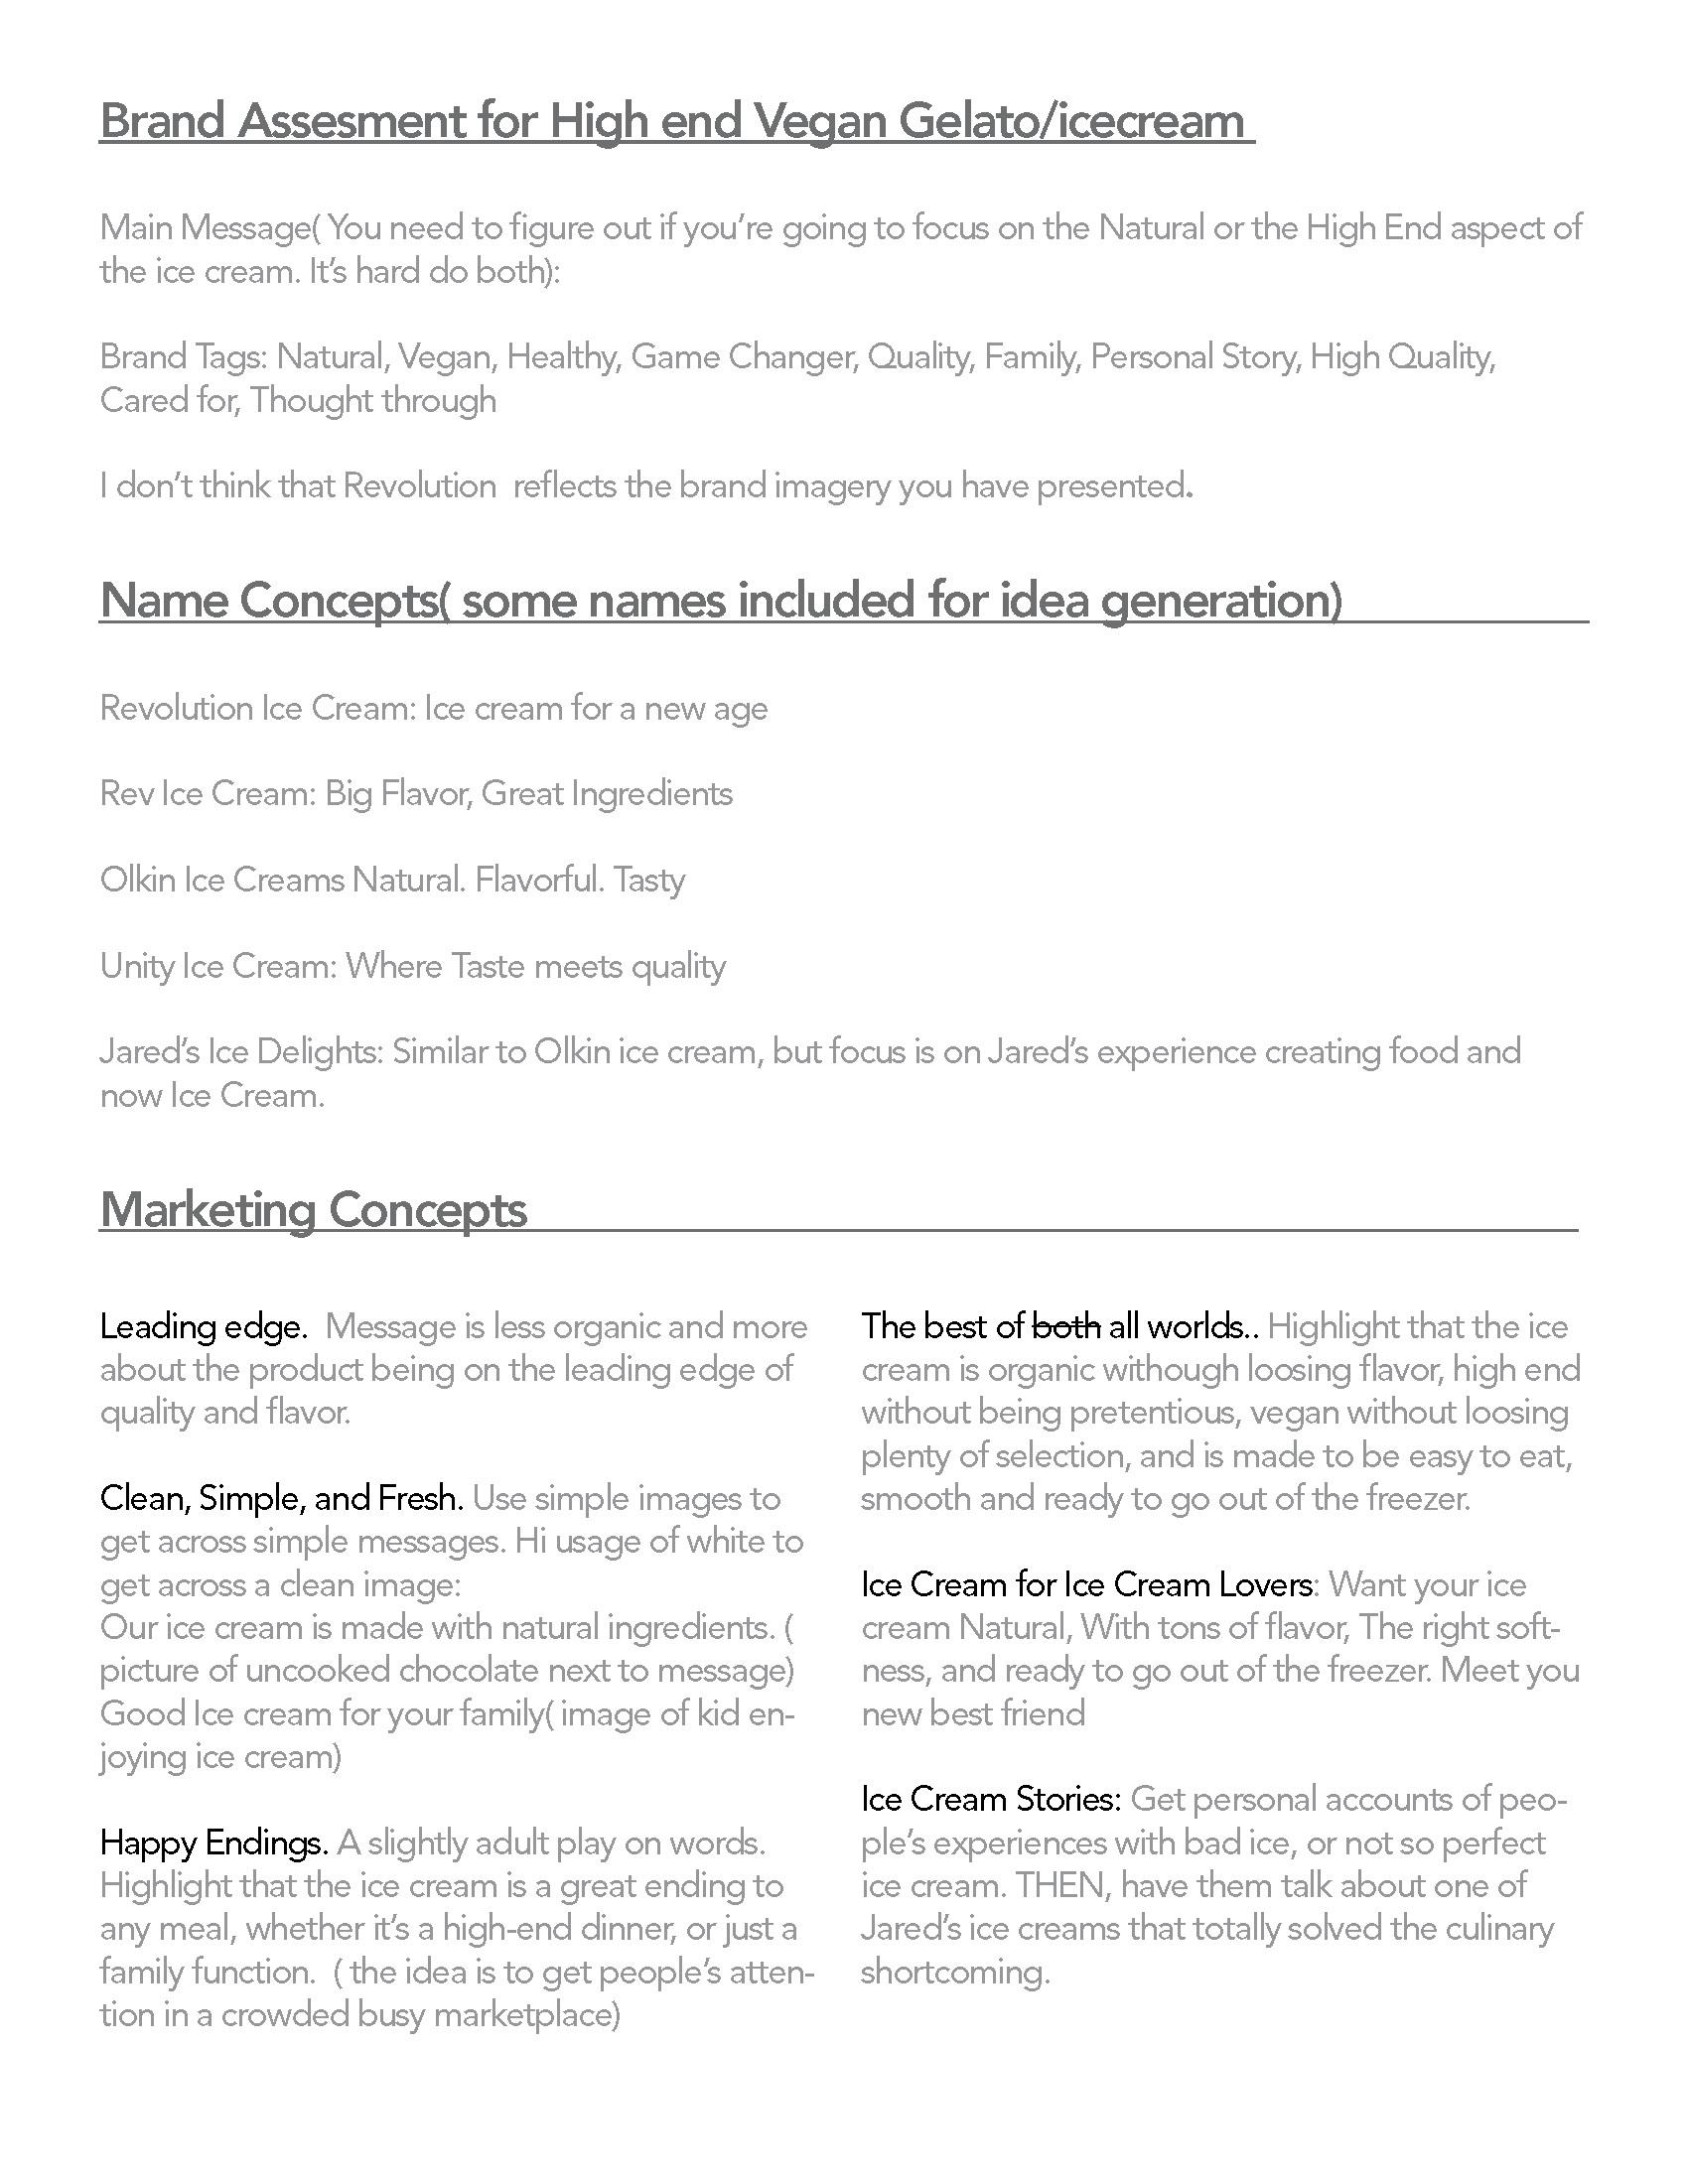 JaredOlkin_Marketing Concepts_Page_12.jpg